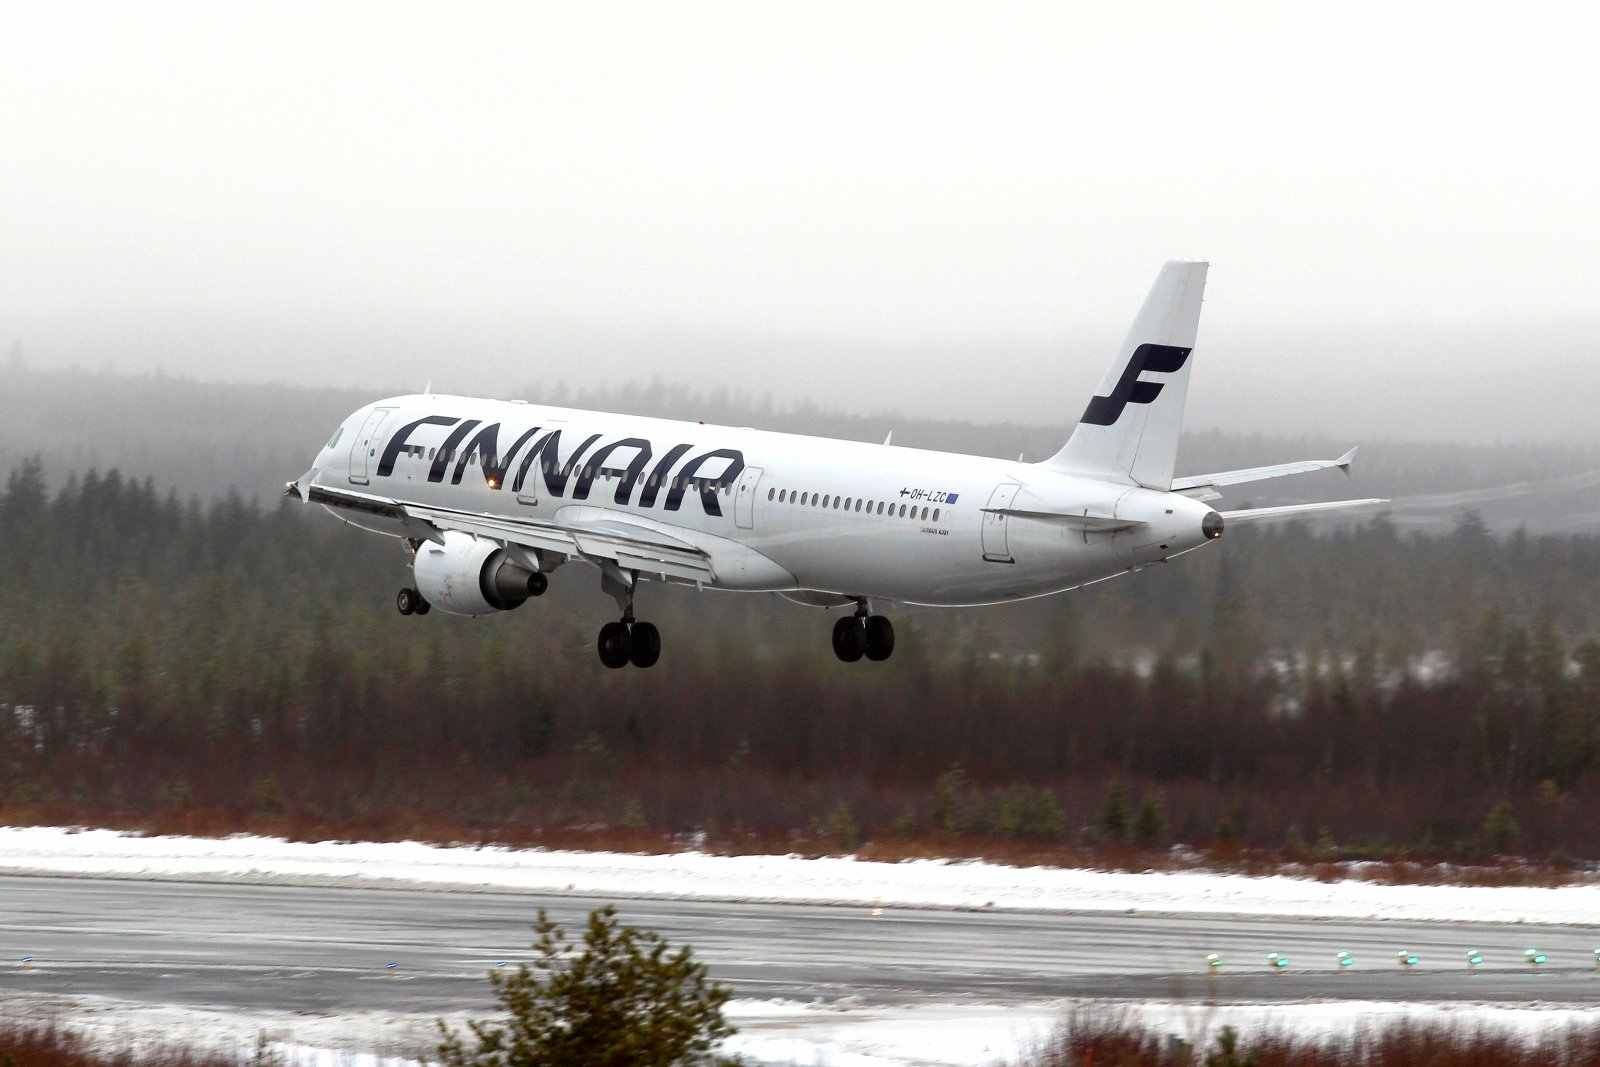 OH-LZC Airbus A321-211 laskussa kiitotielle 16